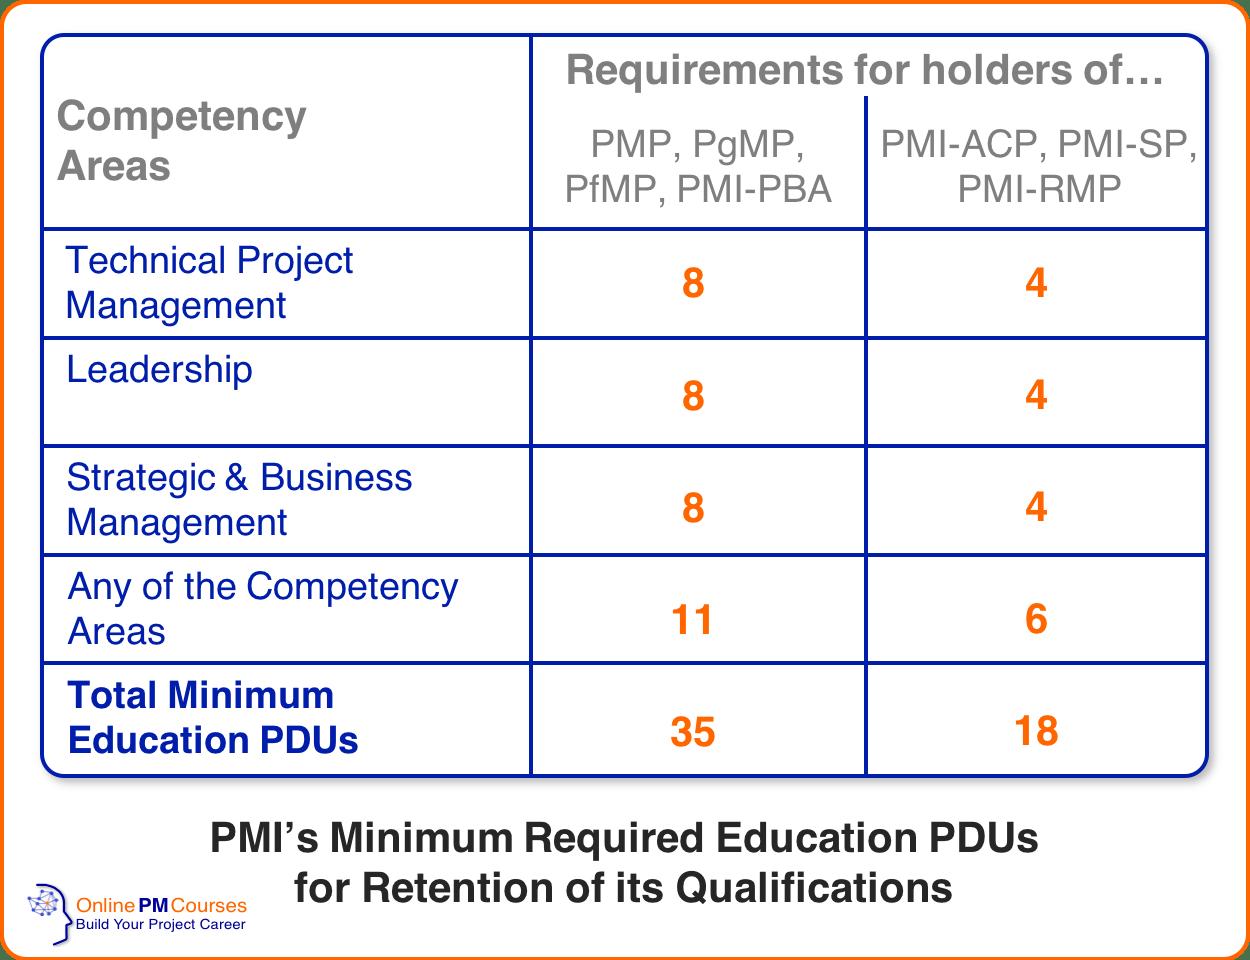 Talent Triangle - Minimum Education PDU Requirements